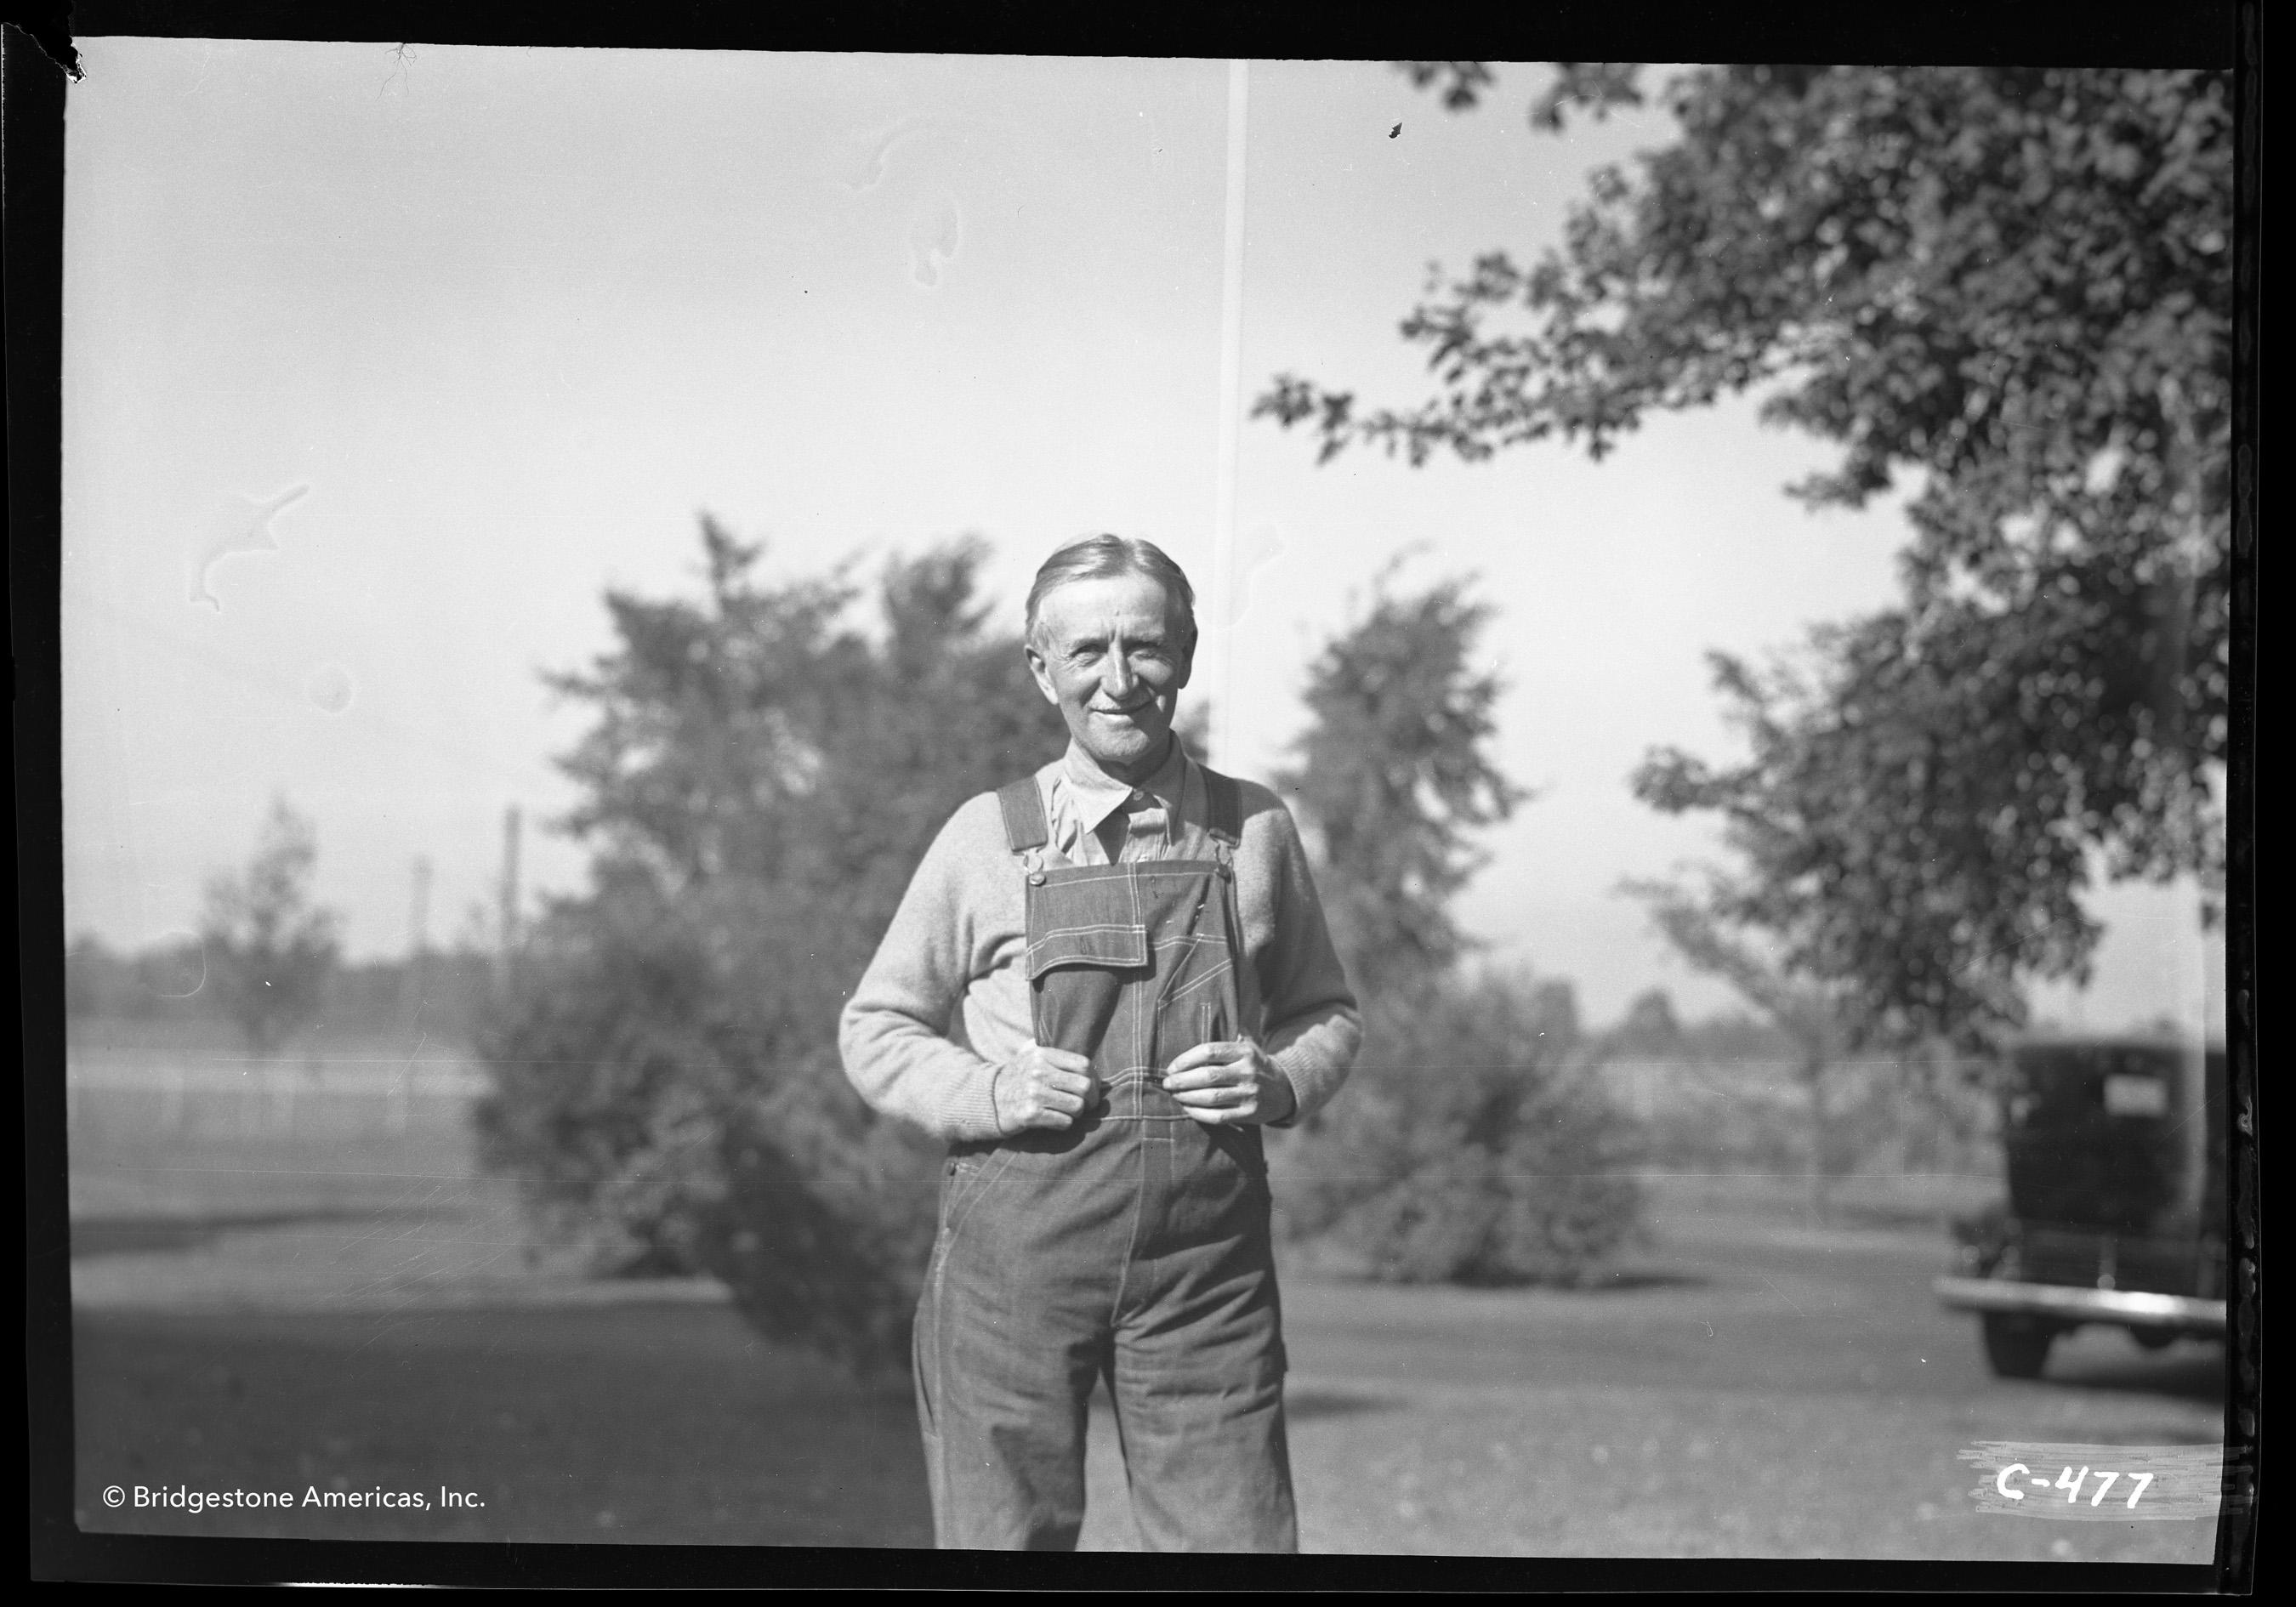 Harvey S. Firestone at his farm in Columbiana, Ohio, in 1935.